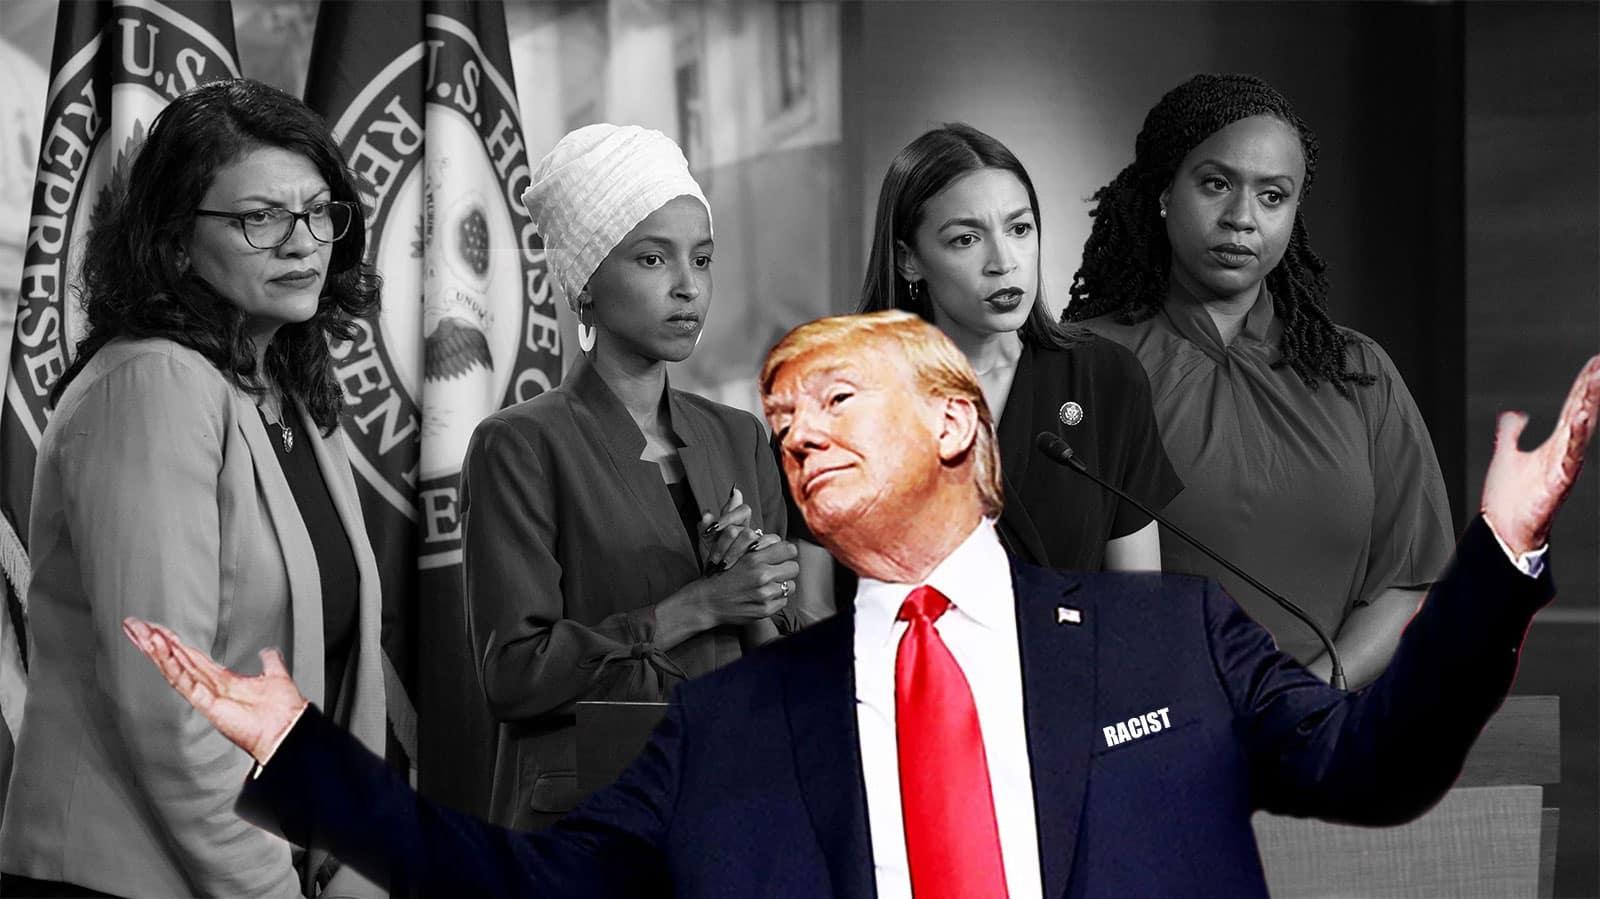 Racist Trump